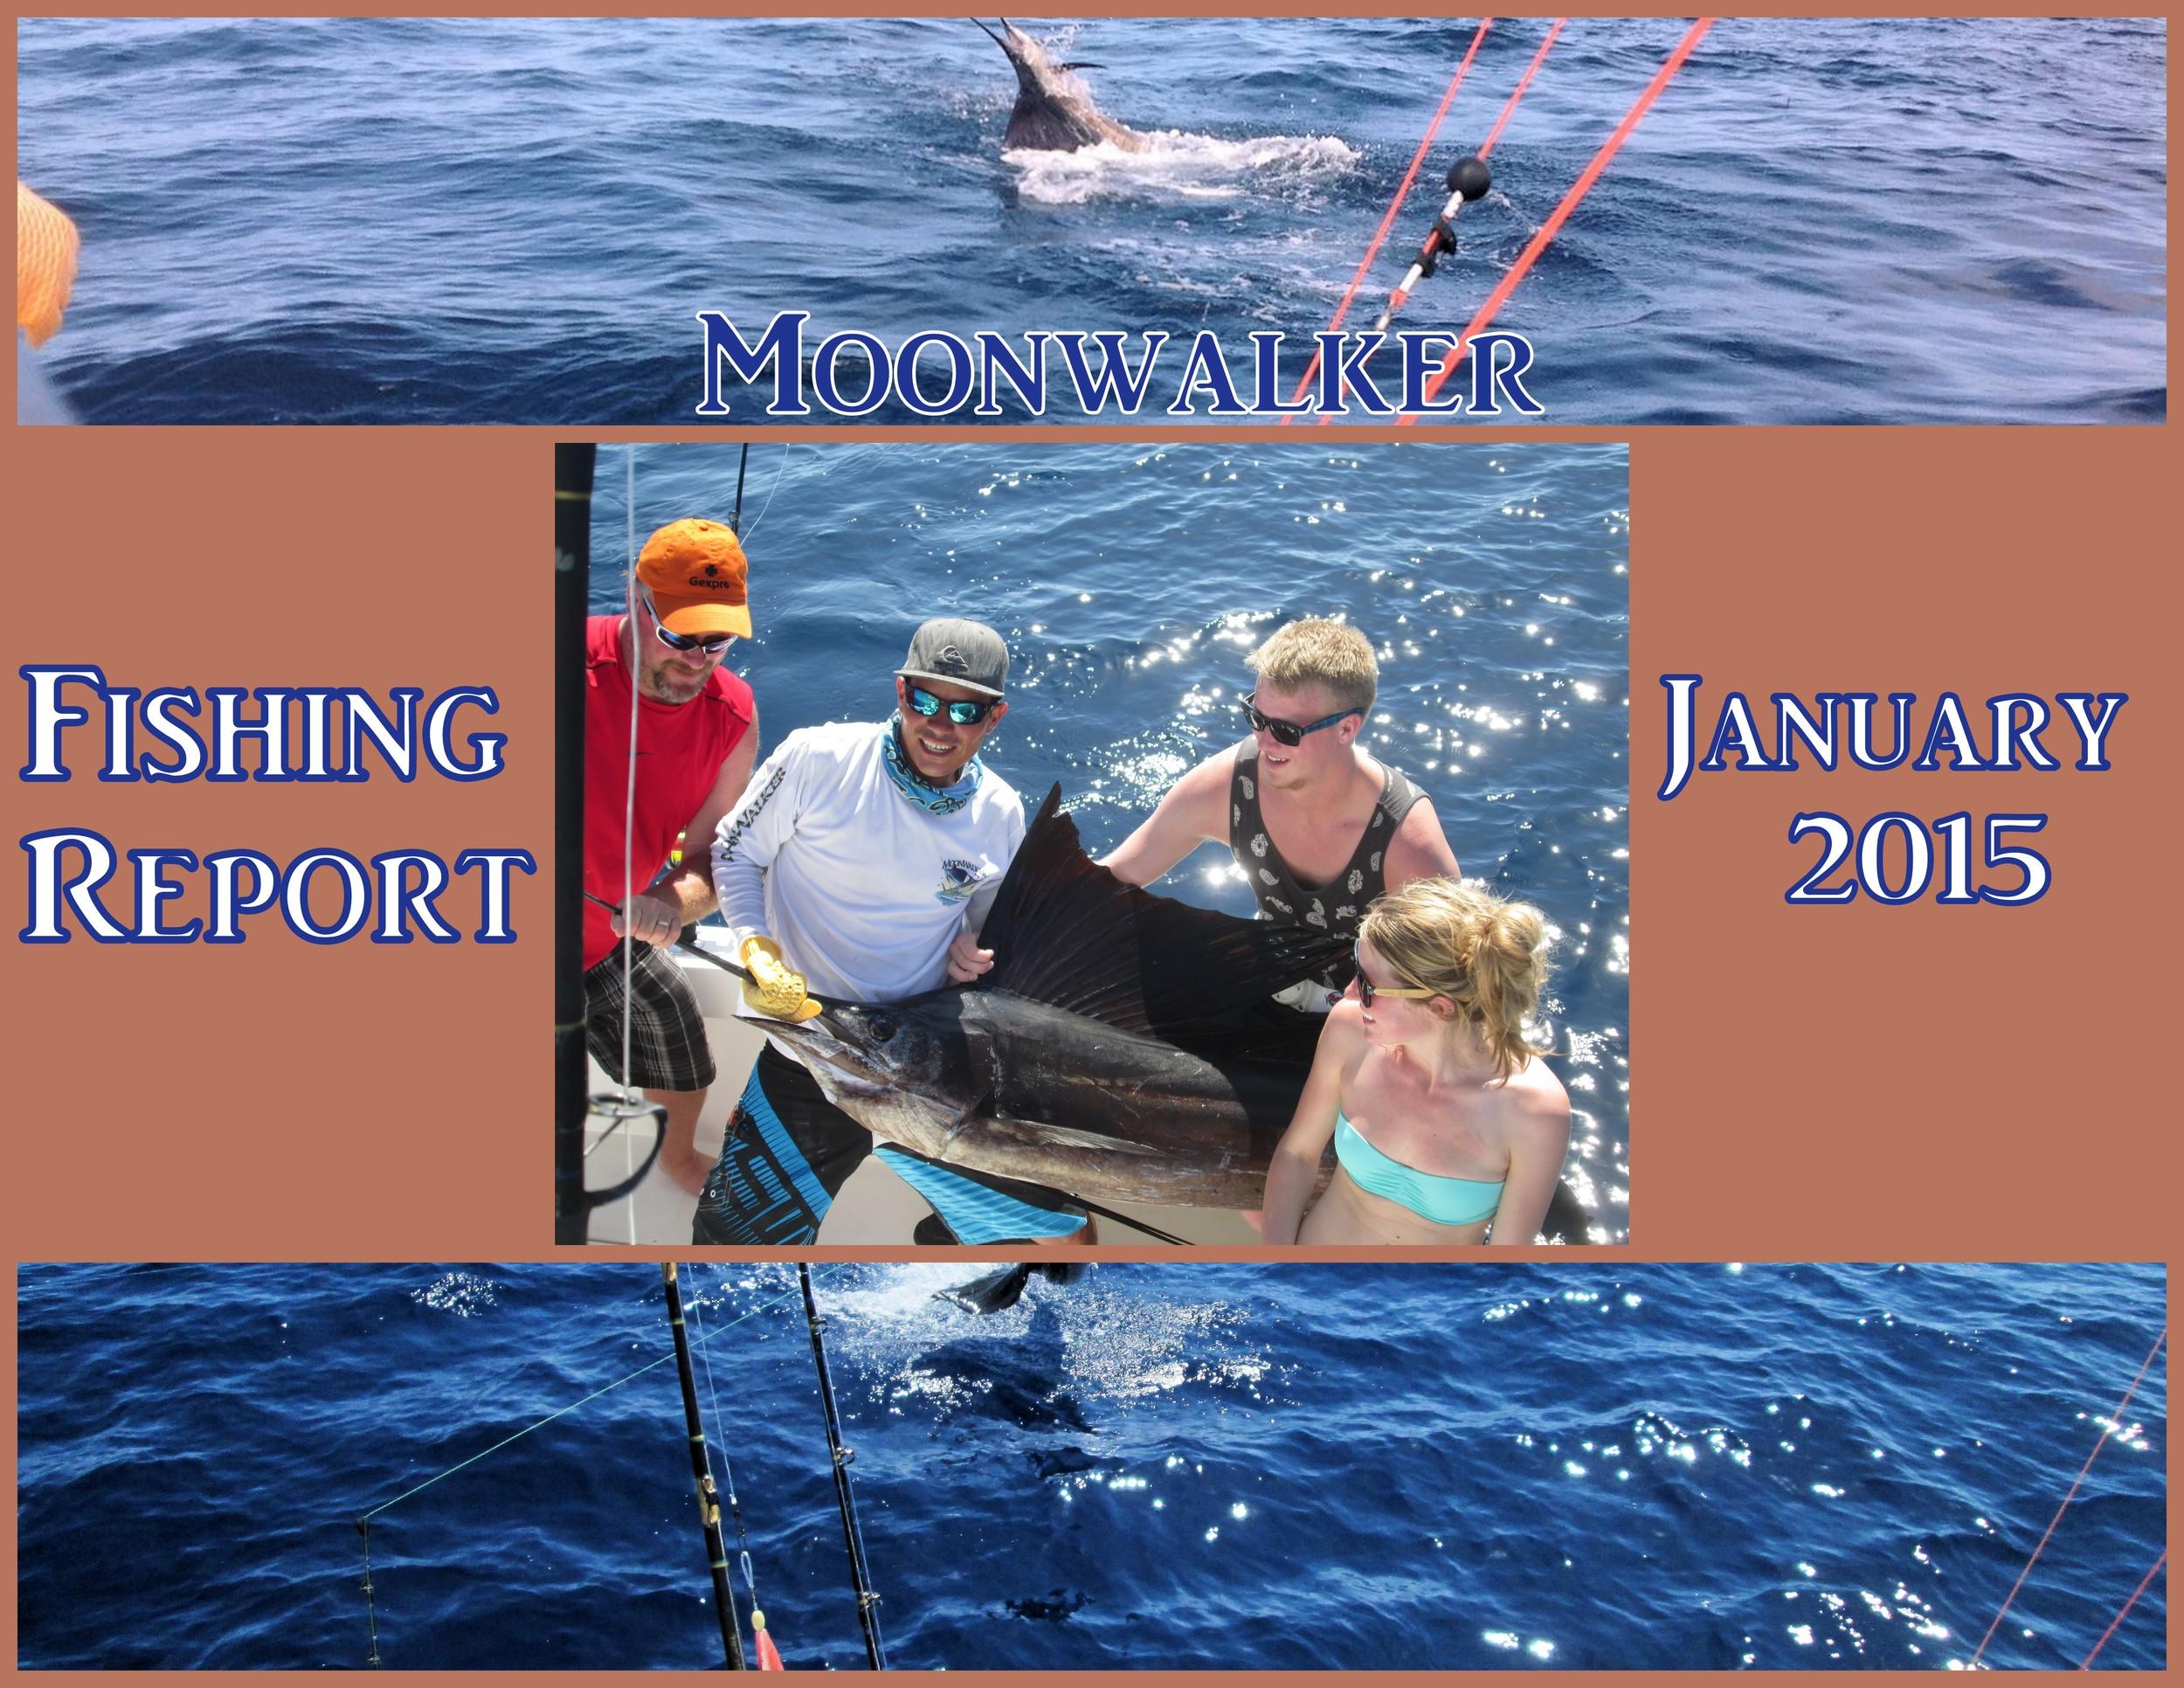 January 2015 Fishing Report.jpg